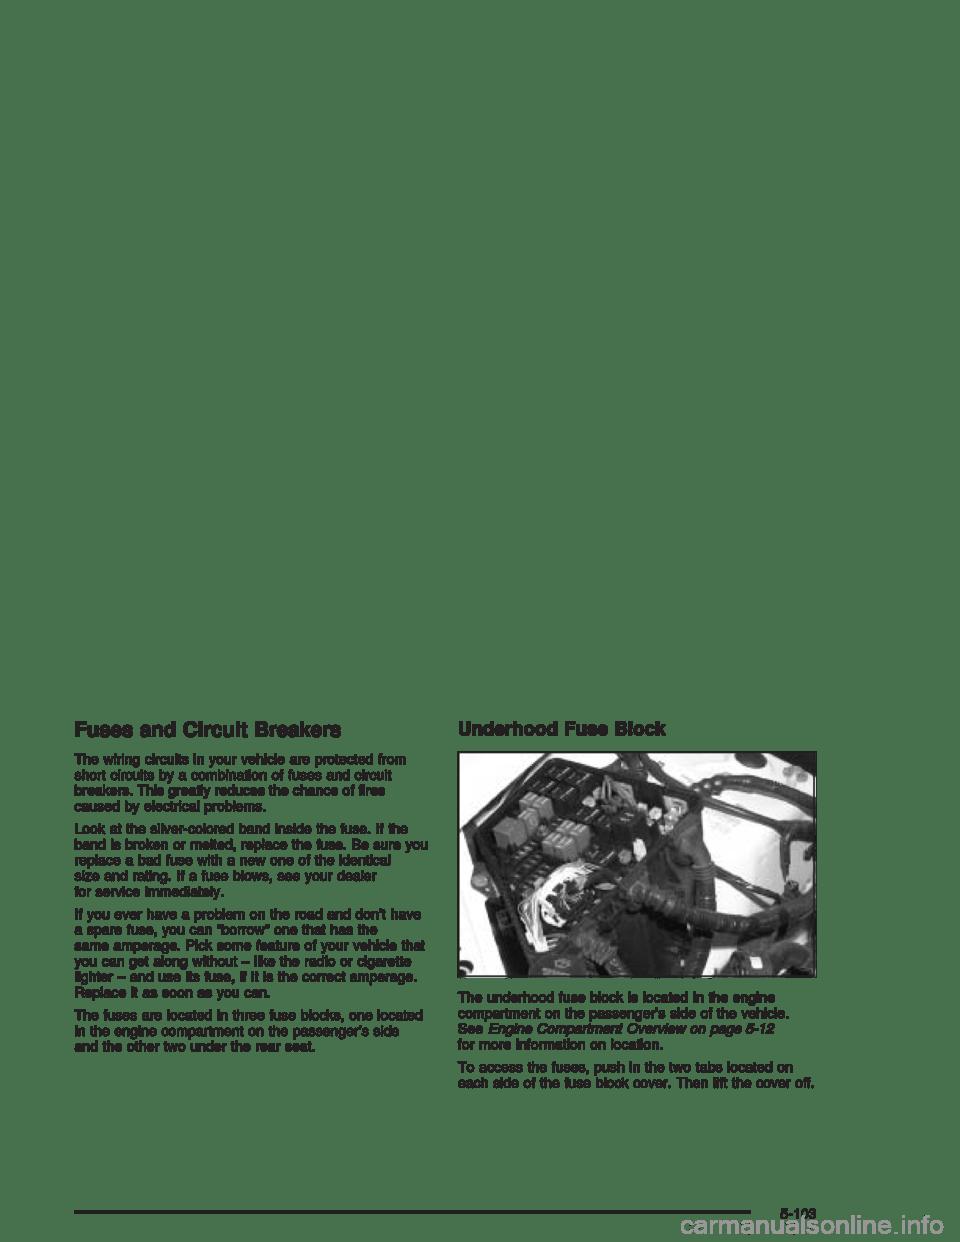 hight resolution of wrg 3427 2004 cadillac srx fuse diagram2004 cadillac srx fuse diagram